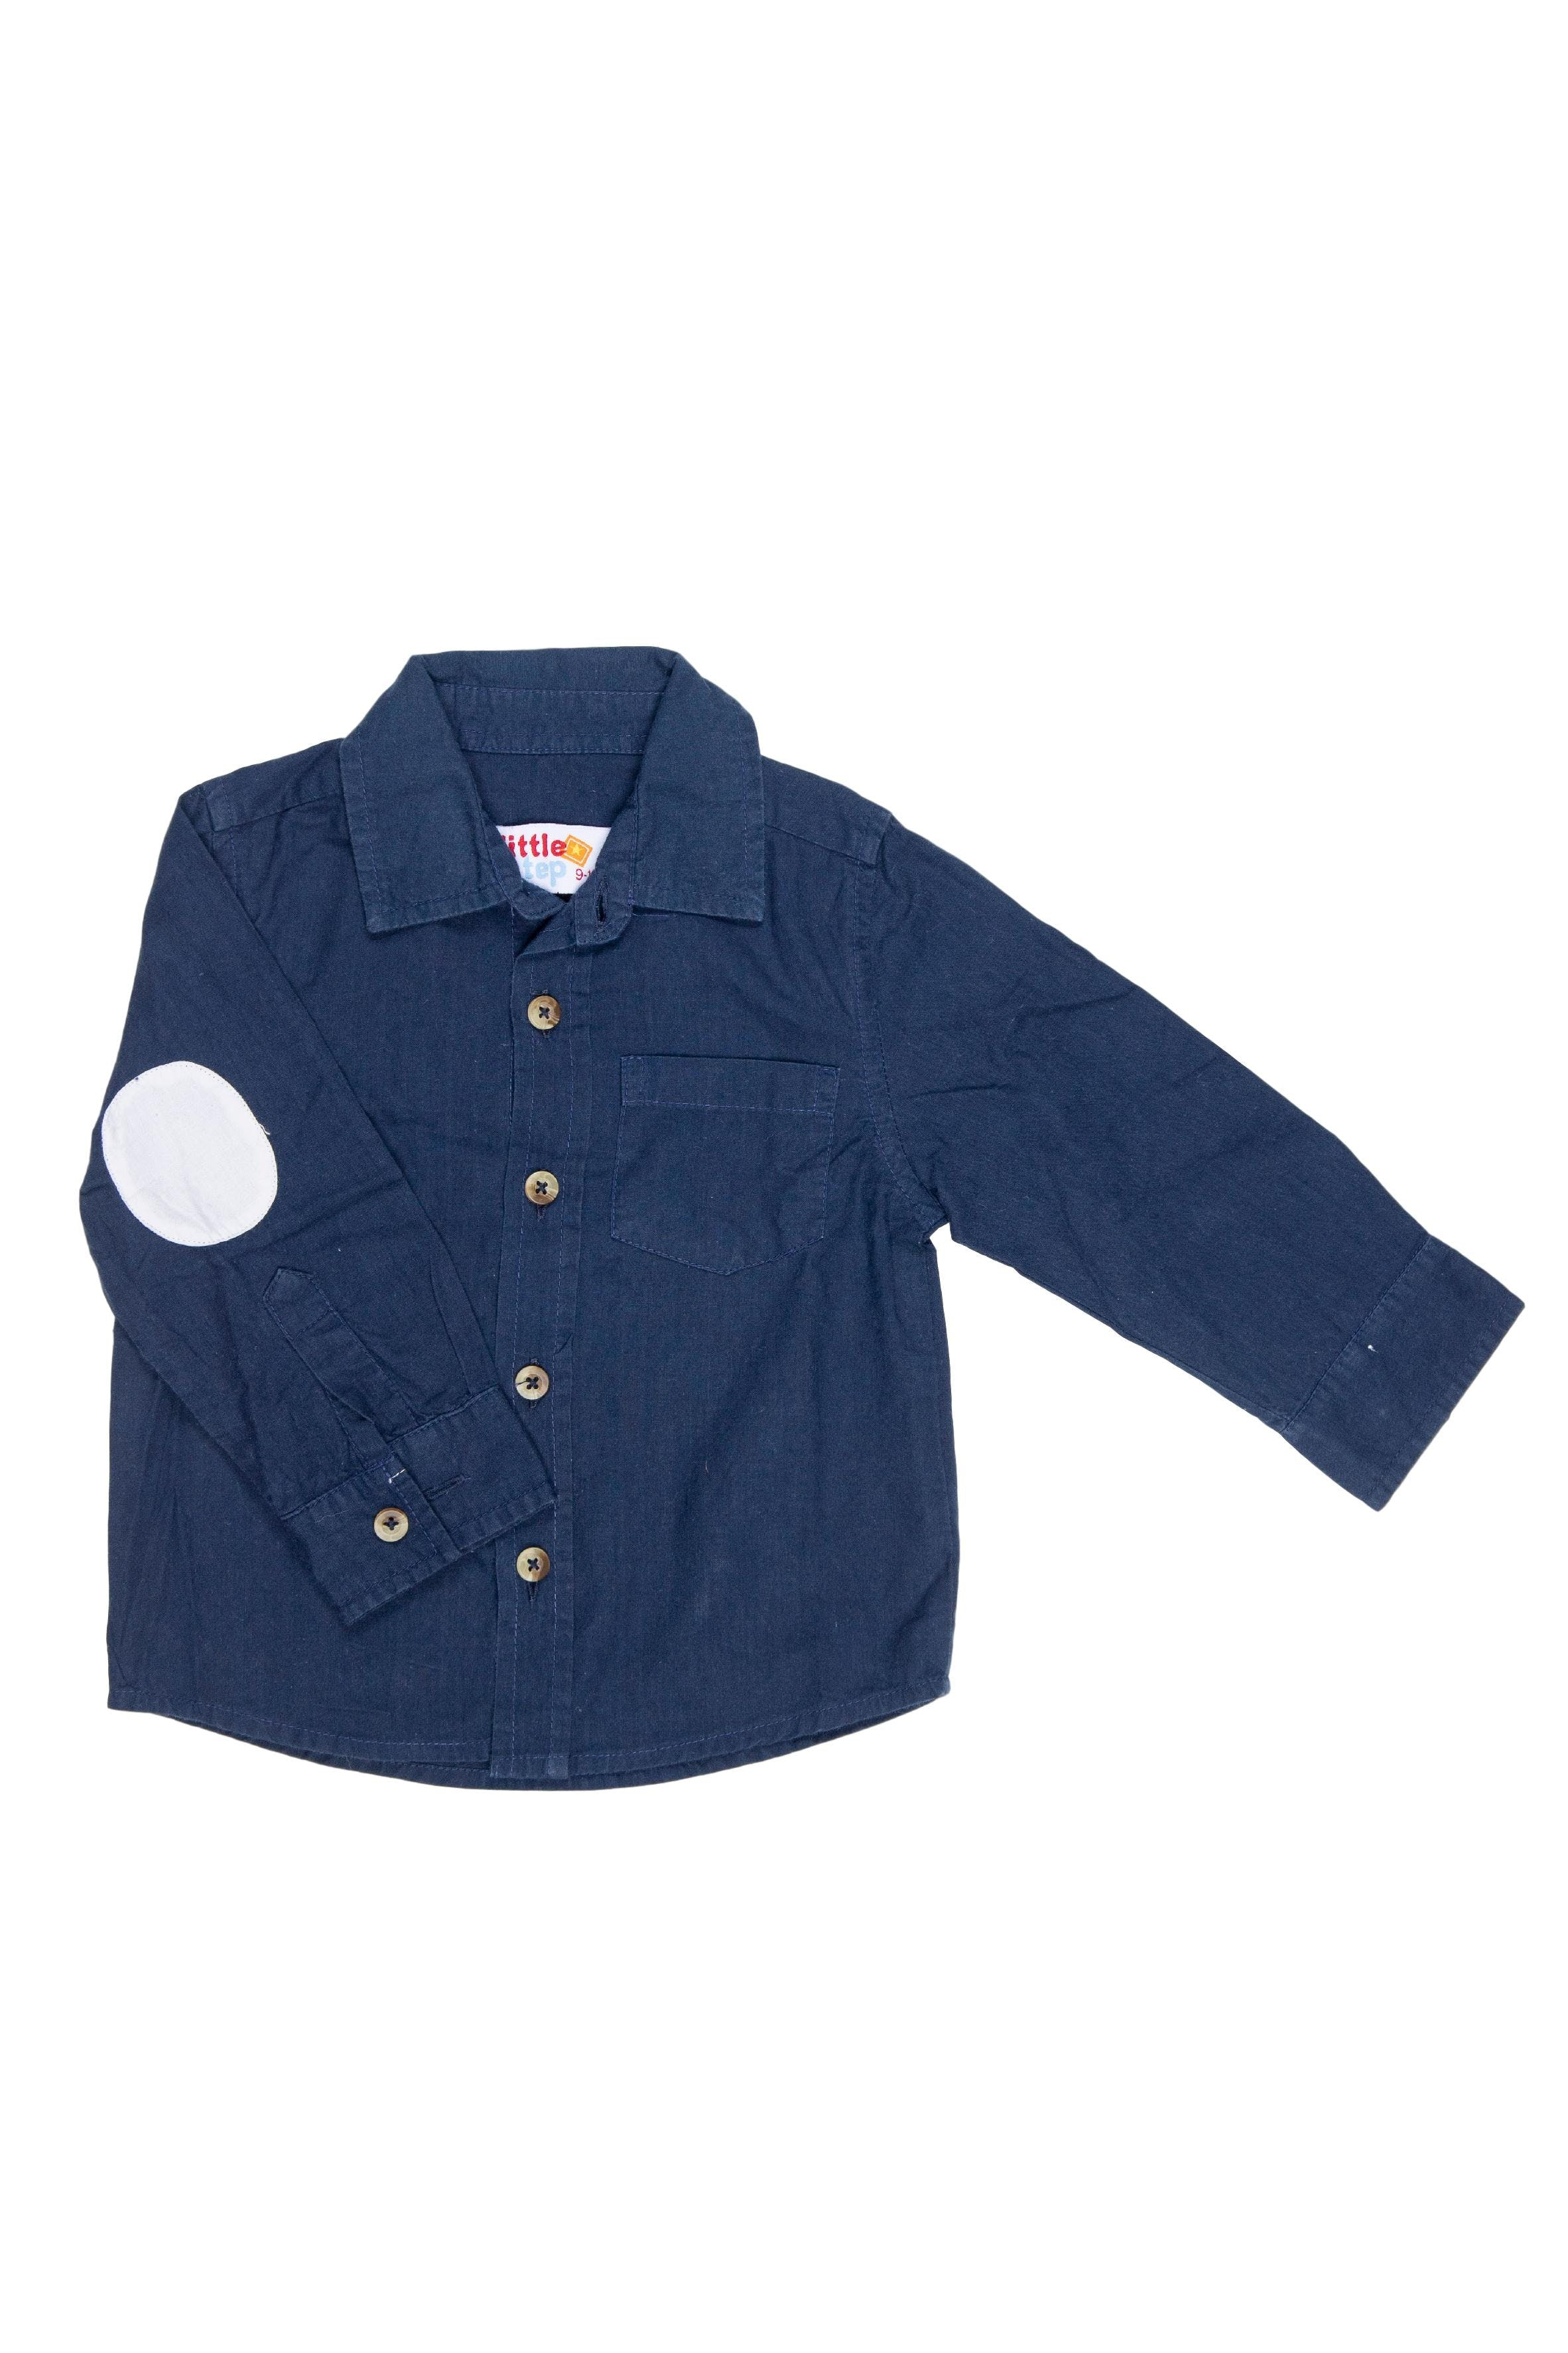 Camisa azul manga larga con coderas 100% algodón. talla en etiqueta: 9 - 12 pero esta marca hace tallas chicas, ponemos desde 6 meses por que calza con medidas estandar - Little Step